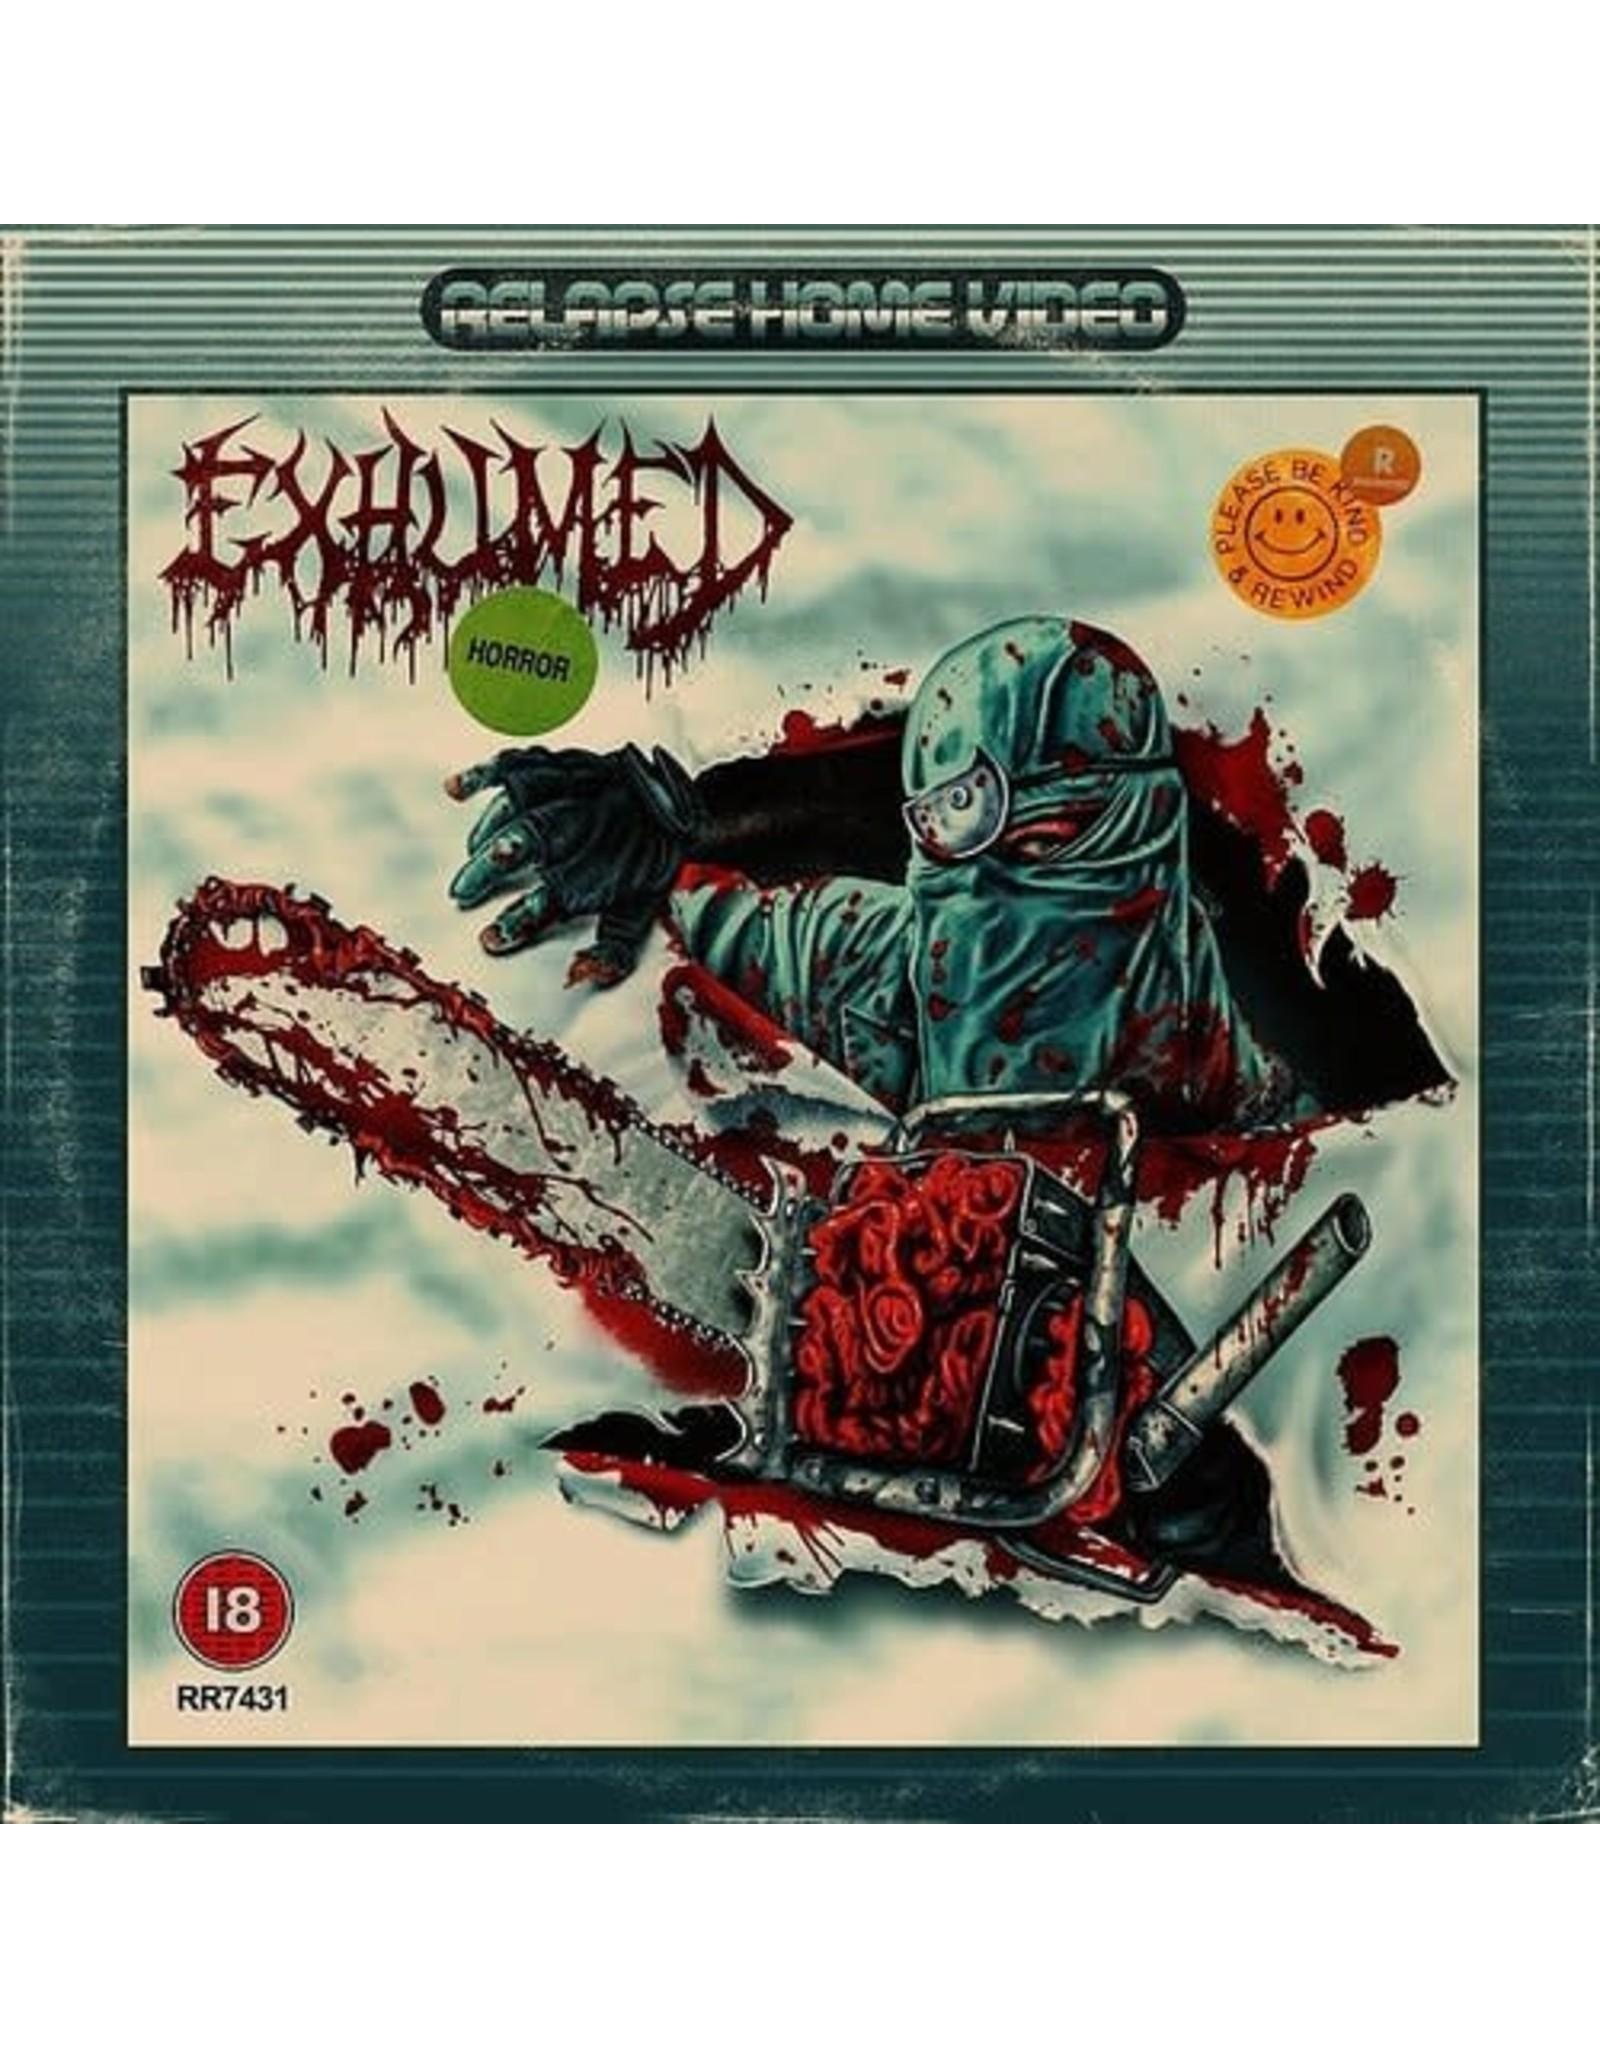 Exhumed - Horror LP Ltd Splatter